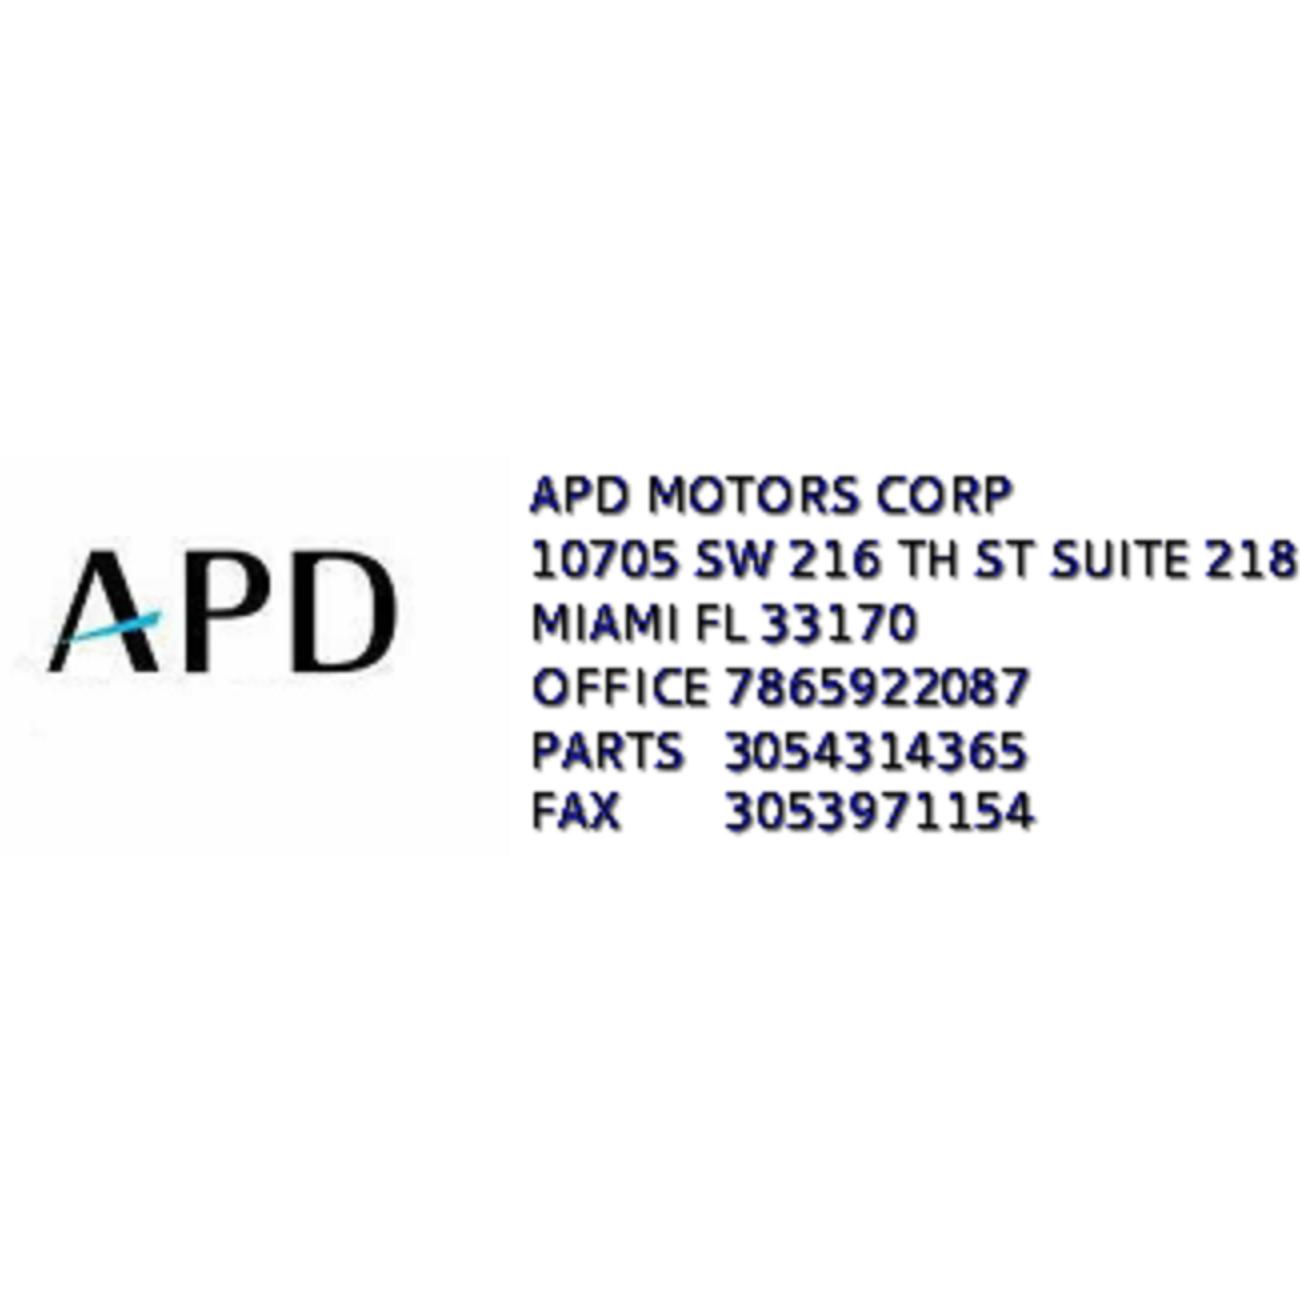 APD MOTORS CORP image 4